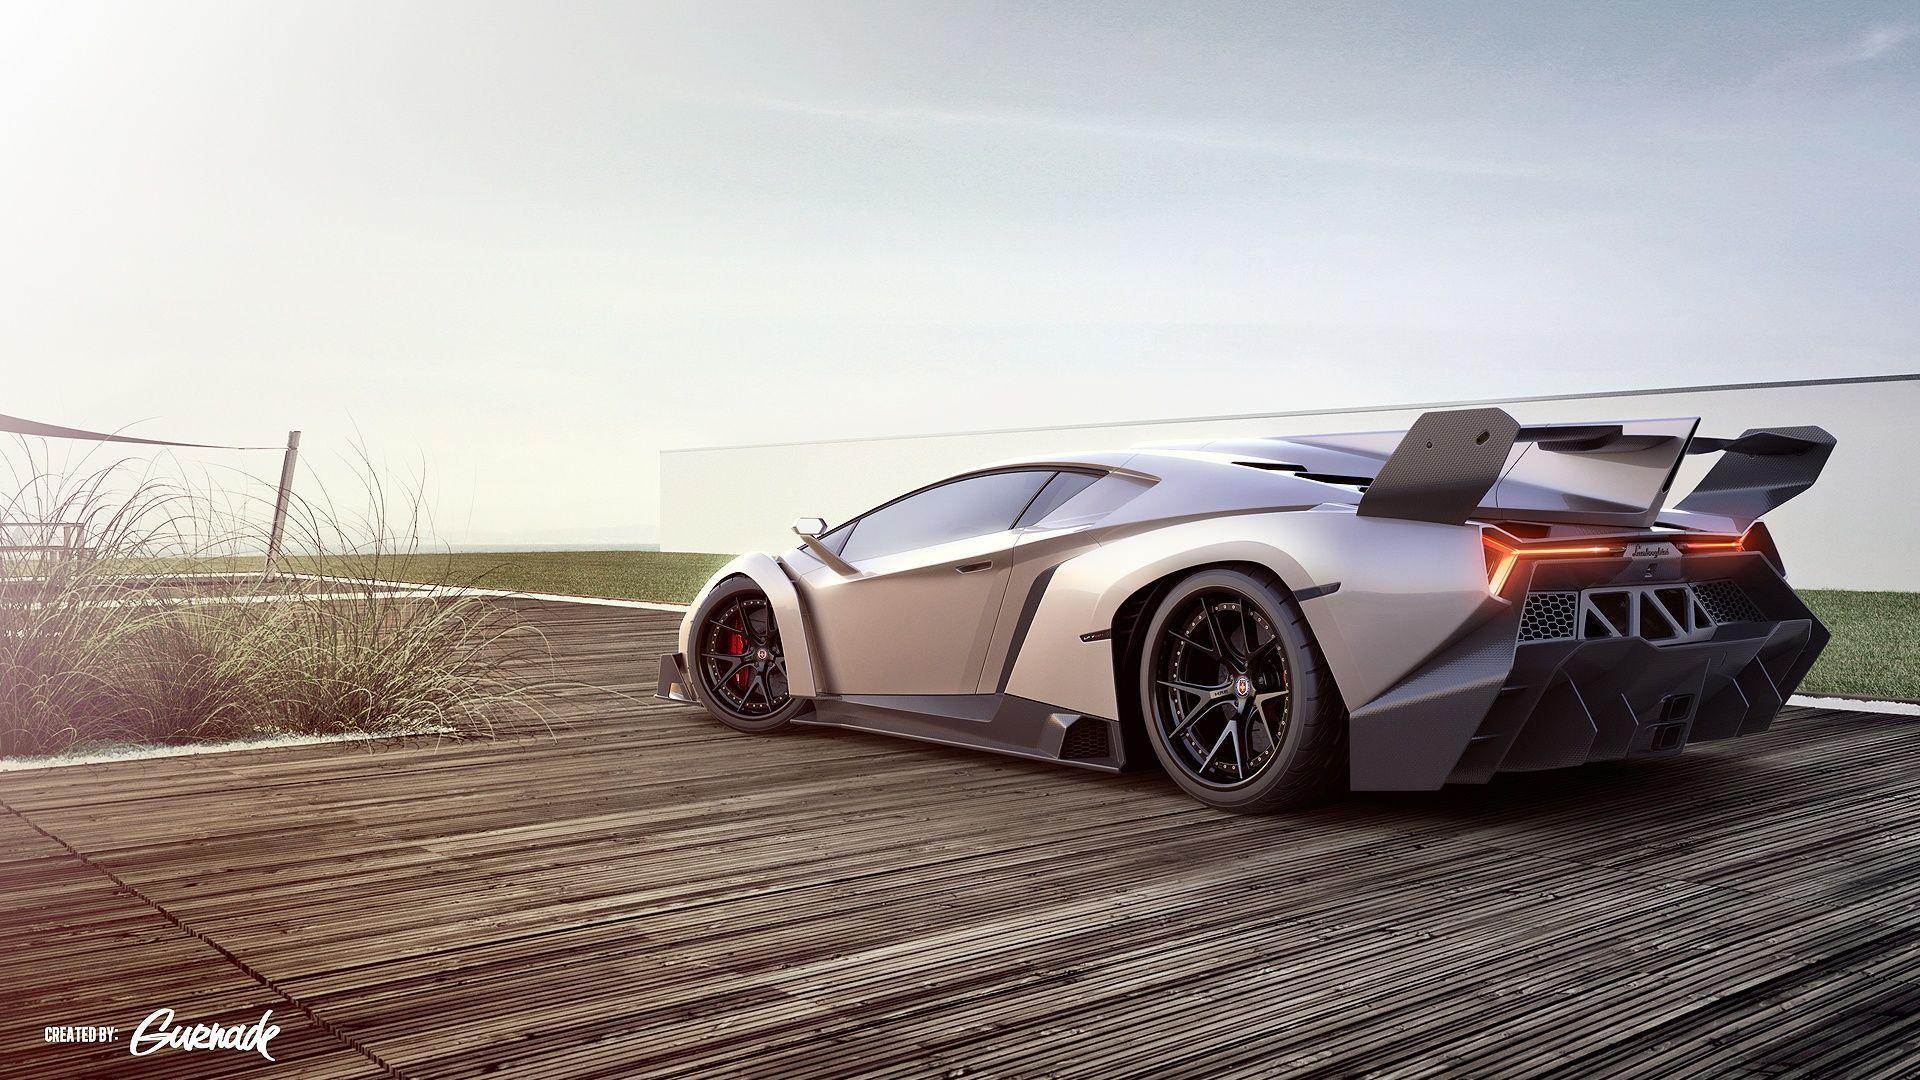 Lamborghini Veneno Wallpapers - Wallpaper Cave